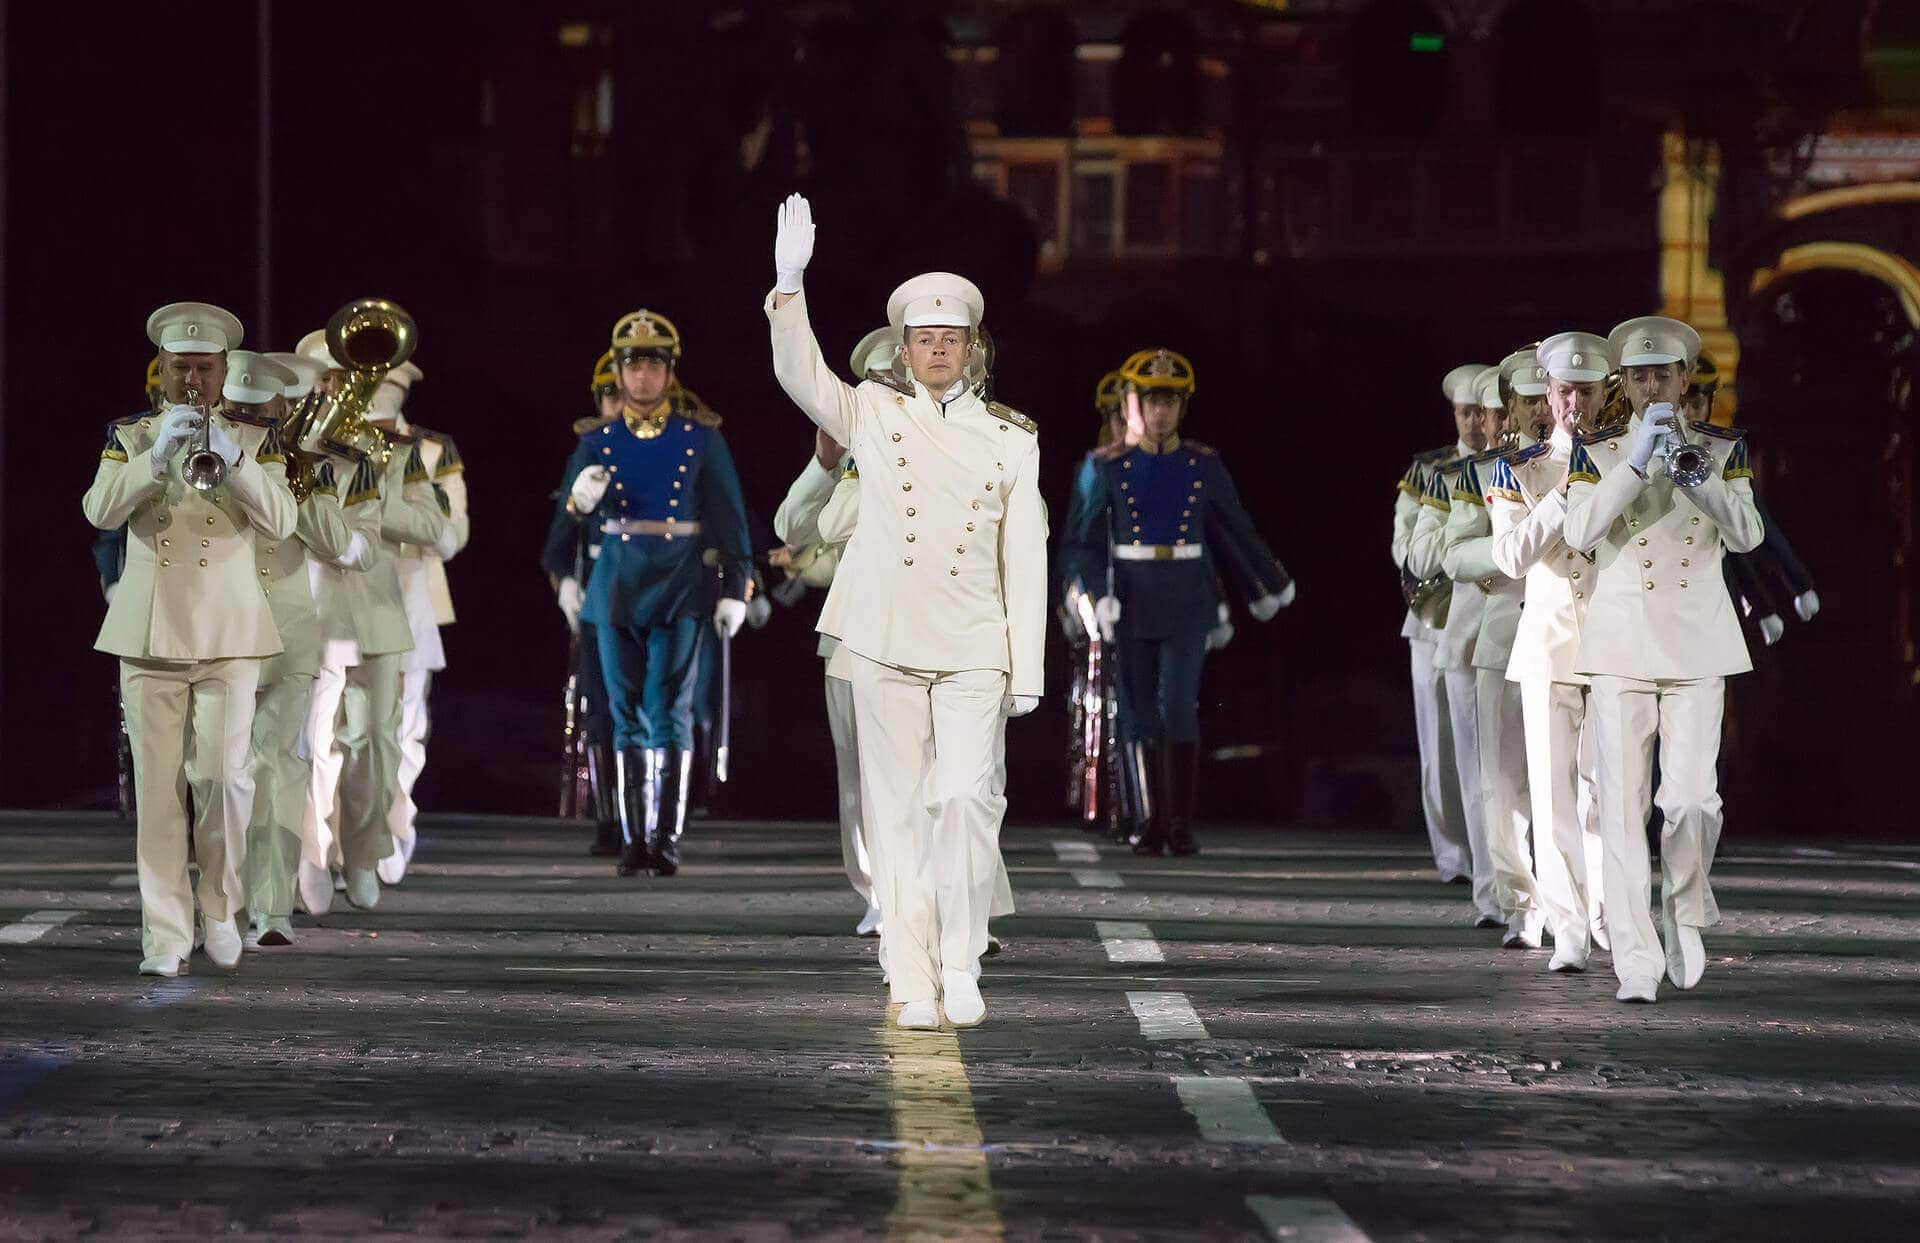 Президентский оркестр отмечает 80-летие